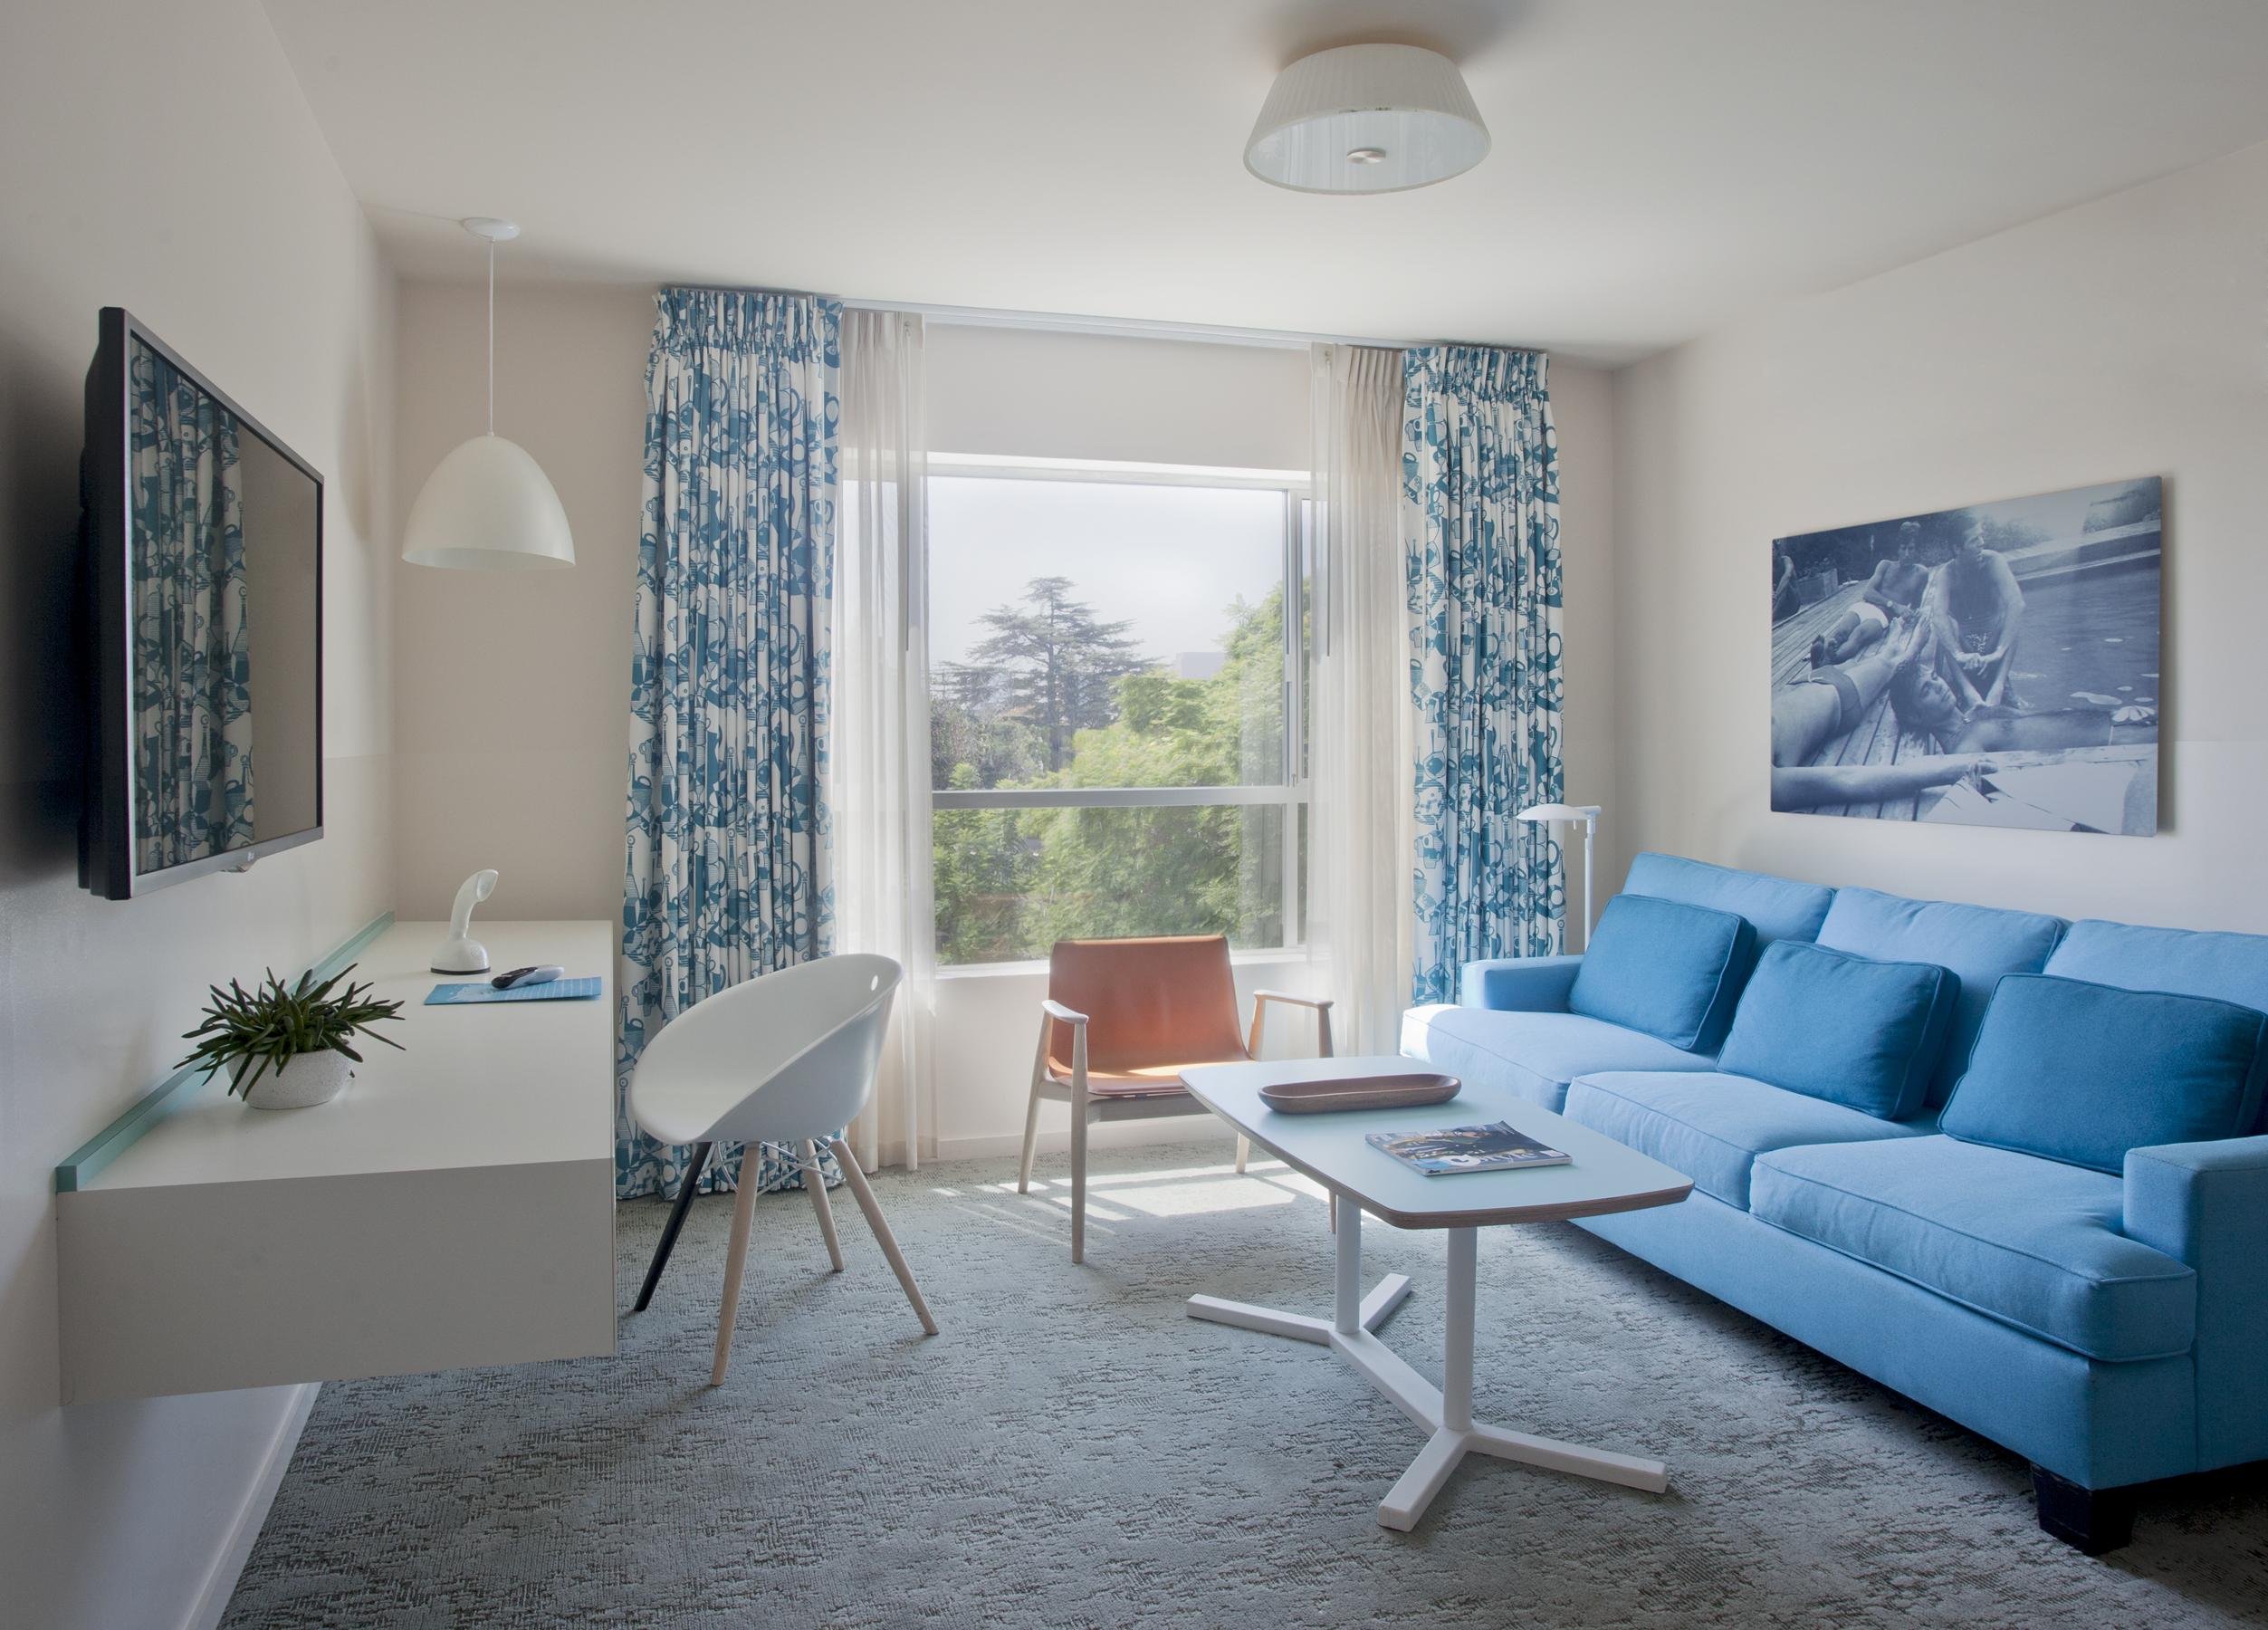 Client spotlight shawn hausman design x beverly laurel for Beverly laurel motor hotel bed bugs